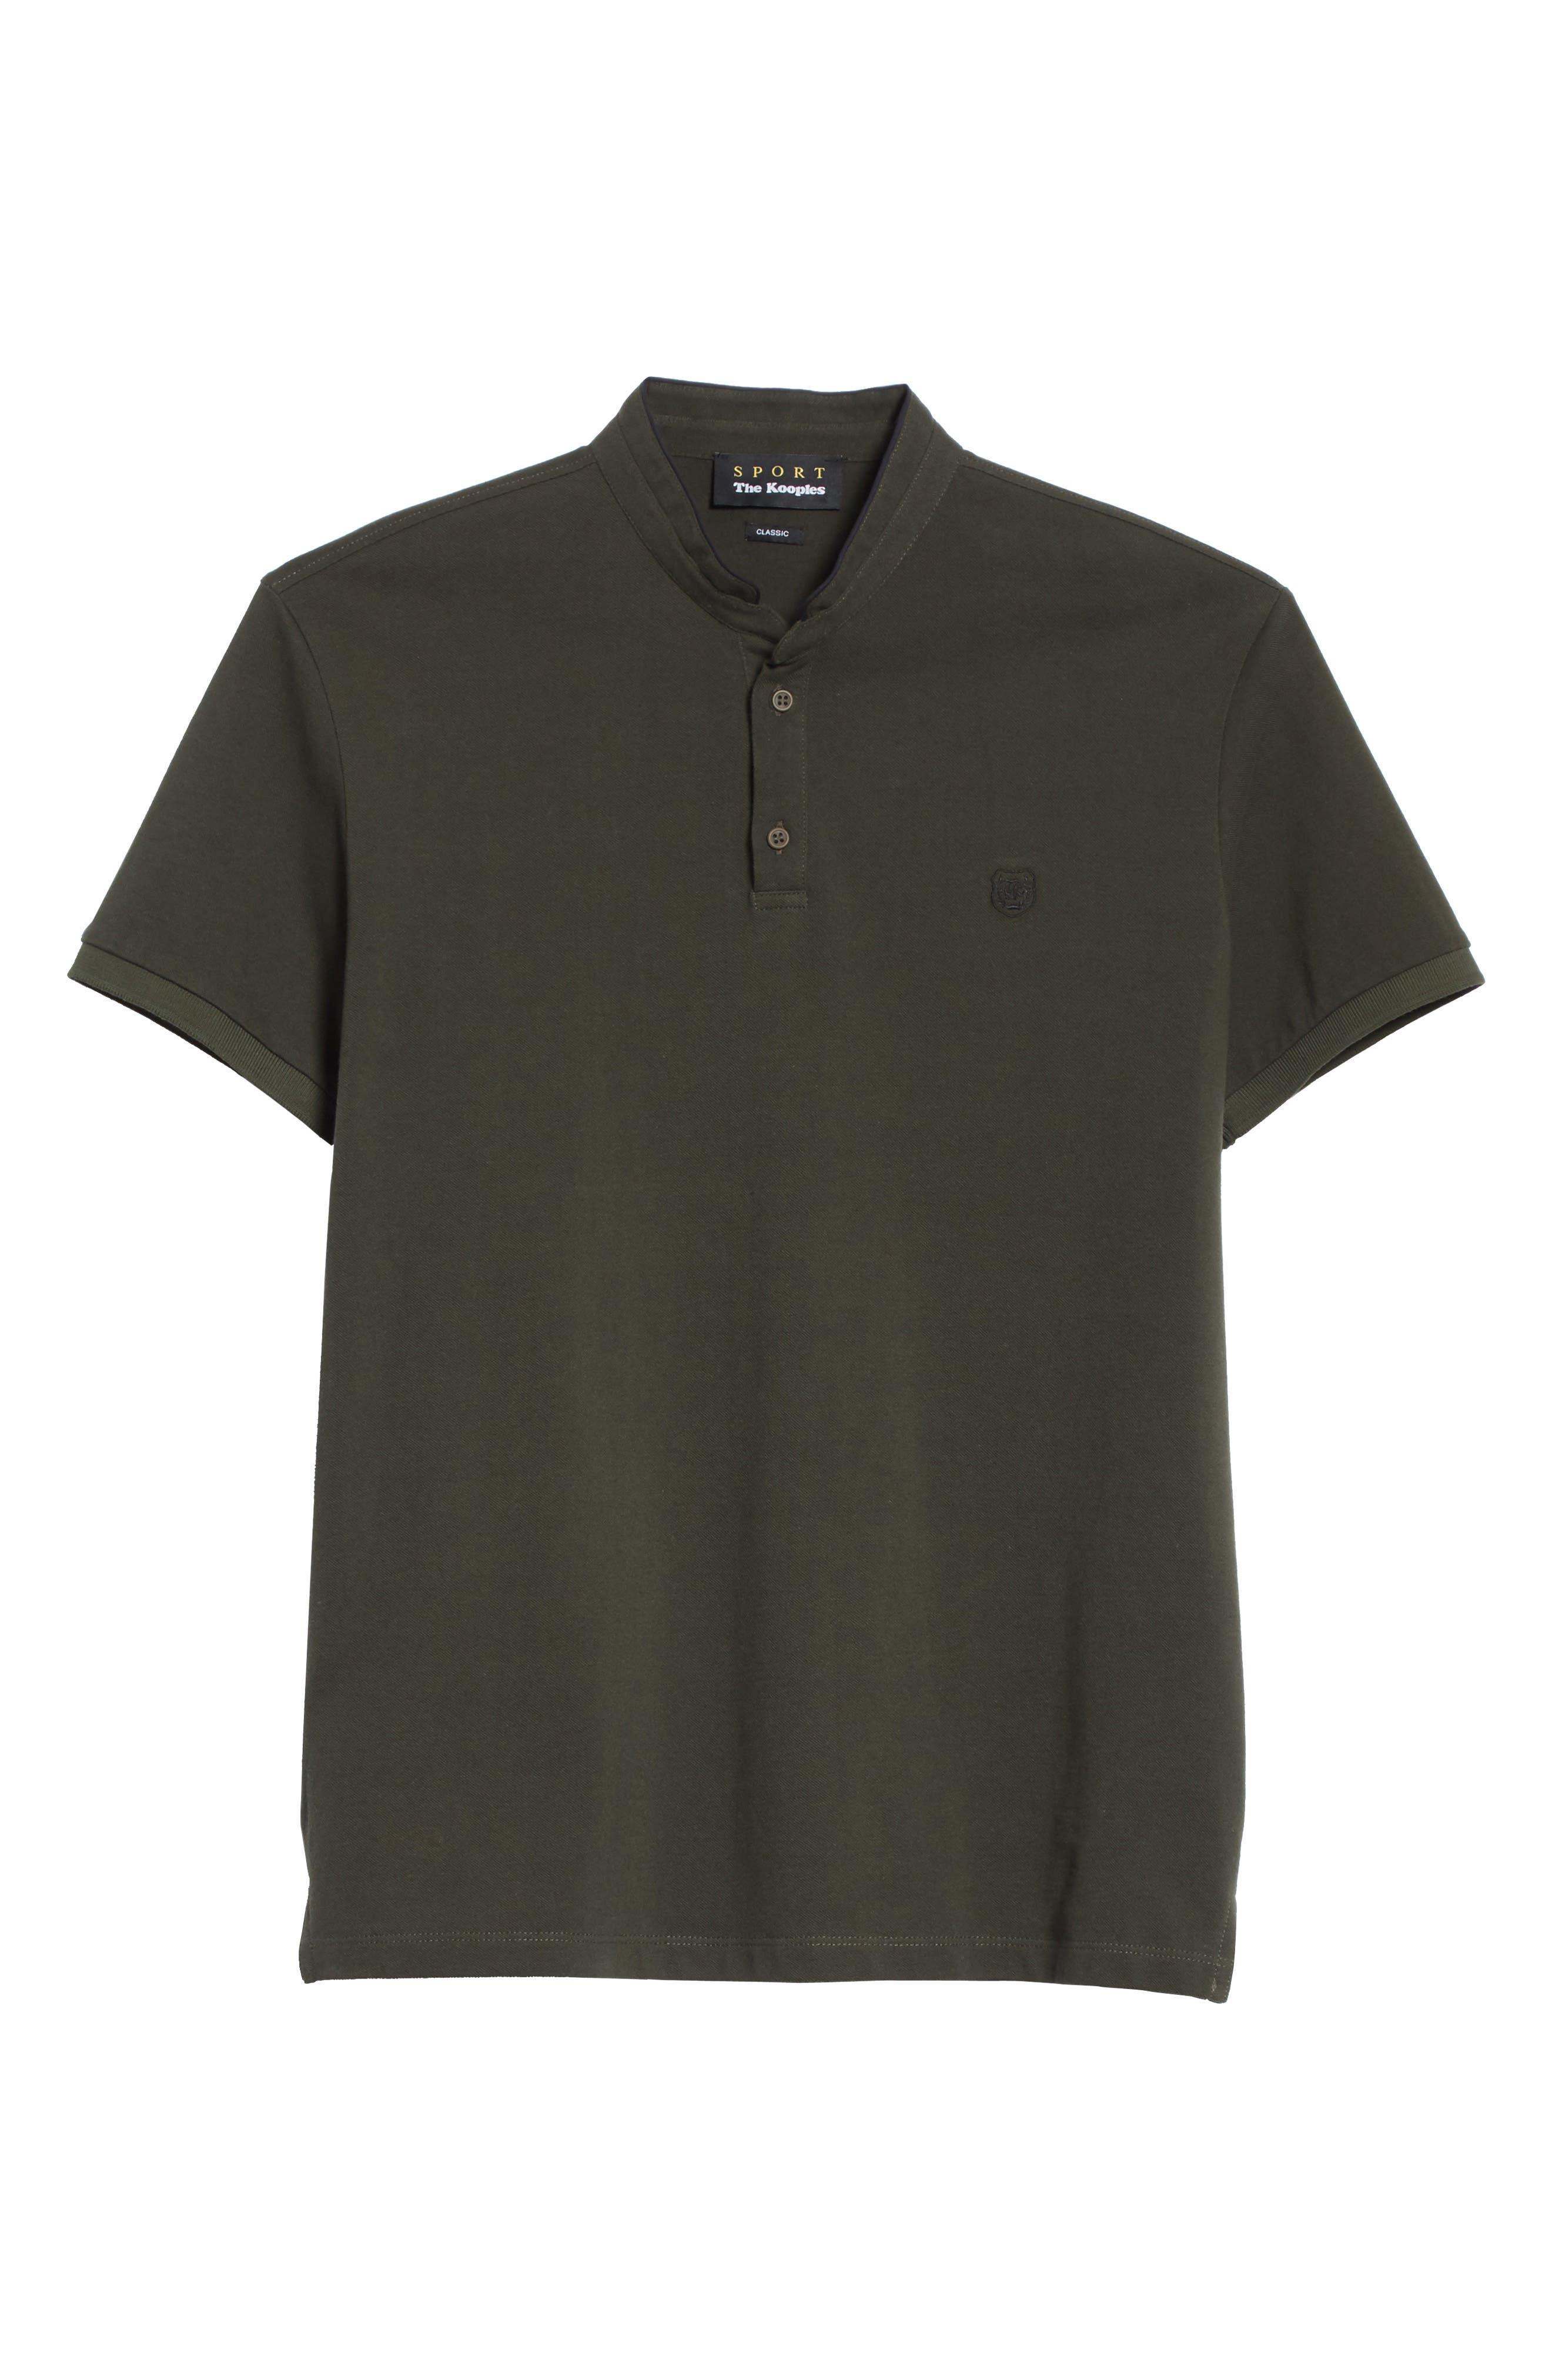 Officer Polo Shirt,                             Alternate thumbnail 6, color,                             311